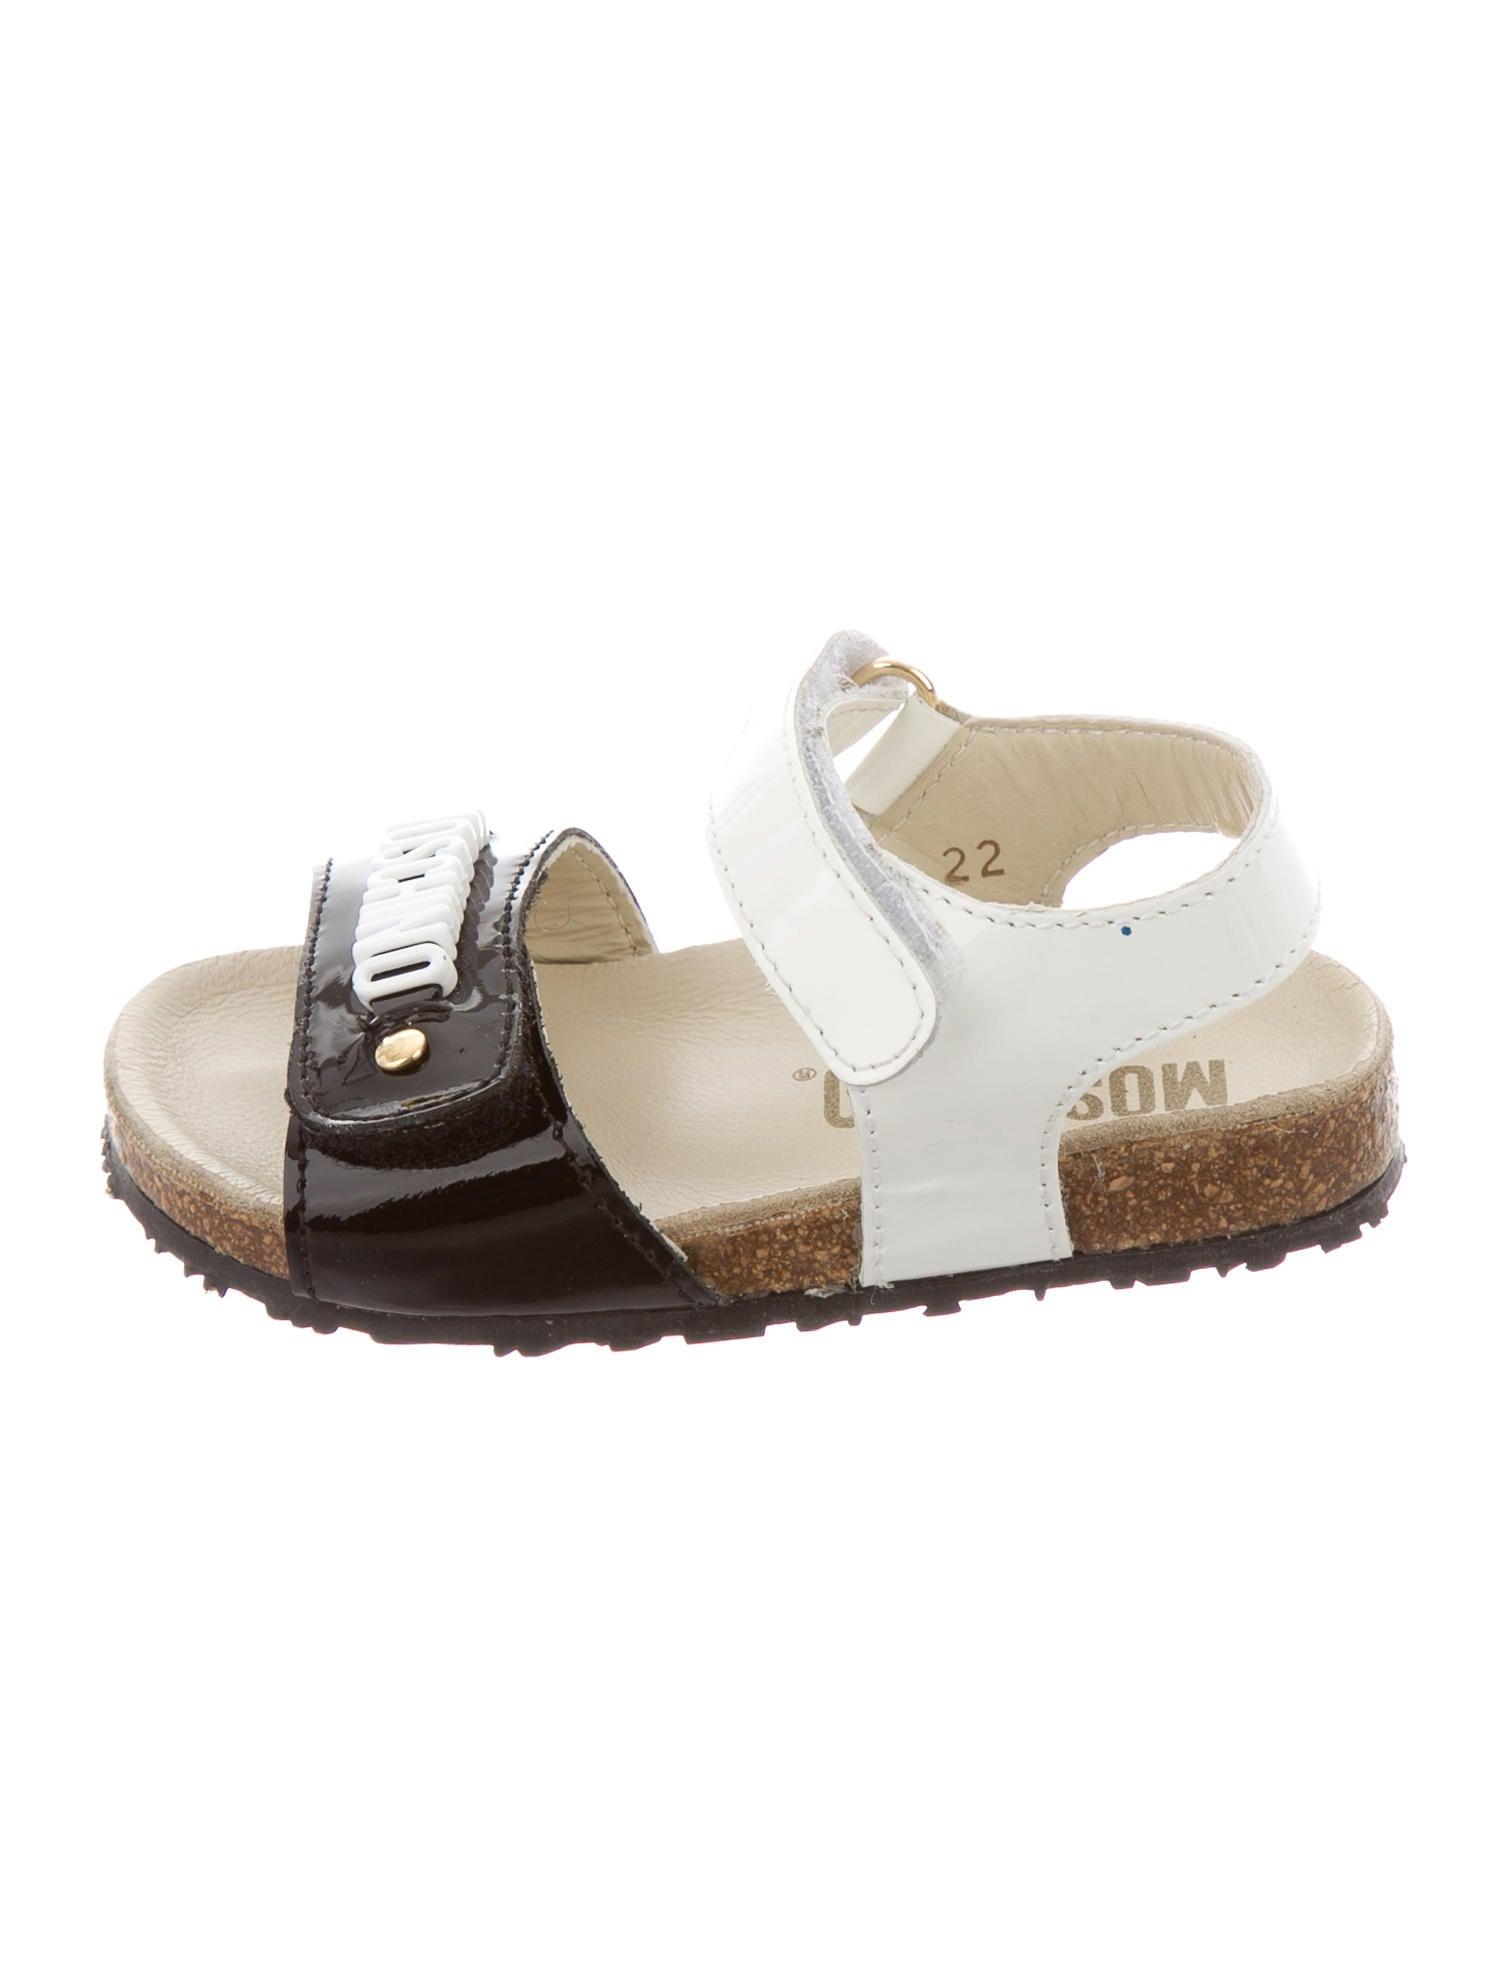 3f3f47e3c07b8 Moschino Girls  Logo-Embellished Multistrap Sandals - Girls ...